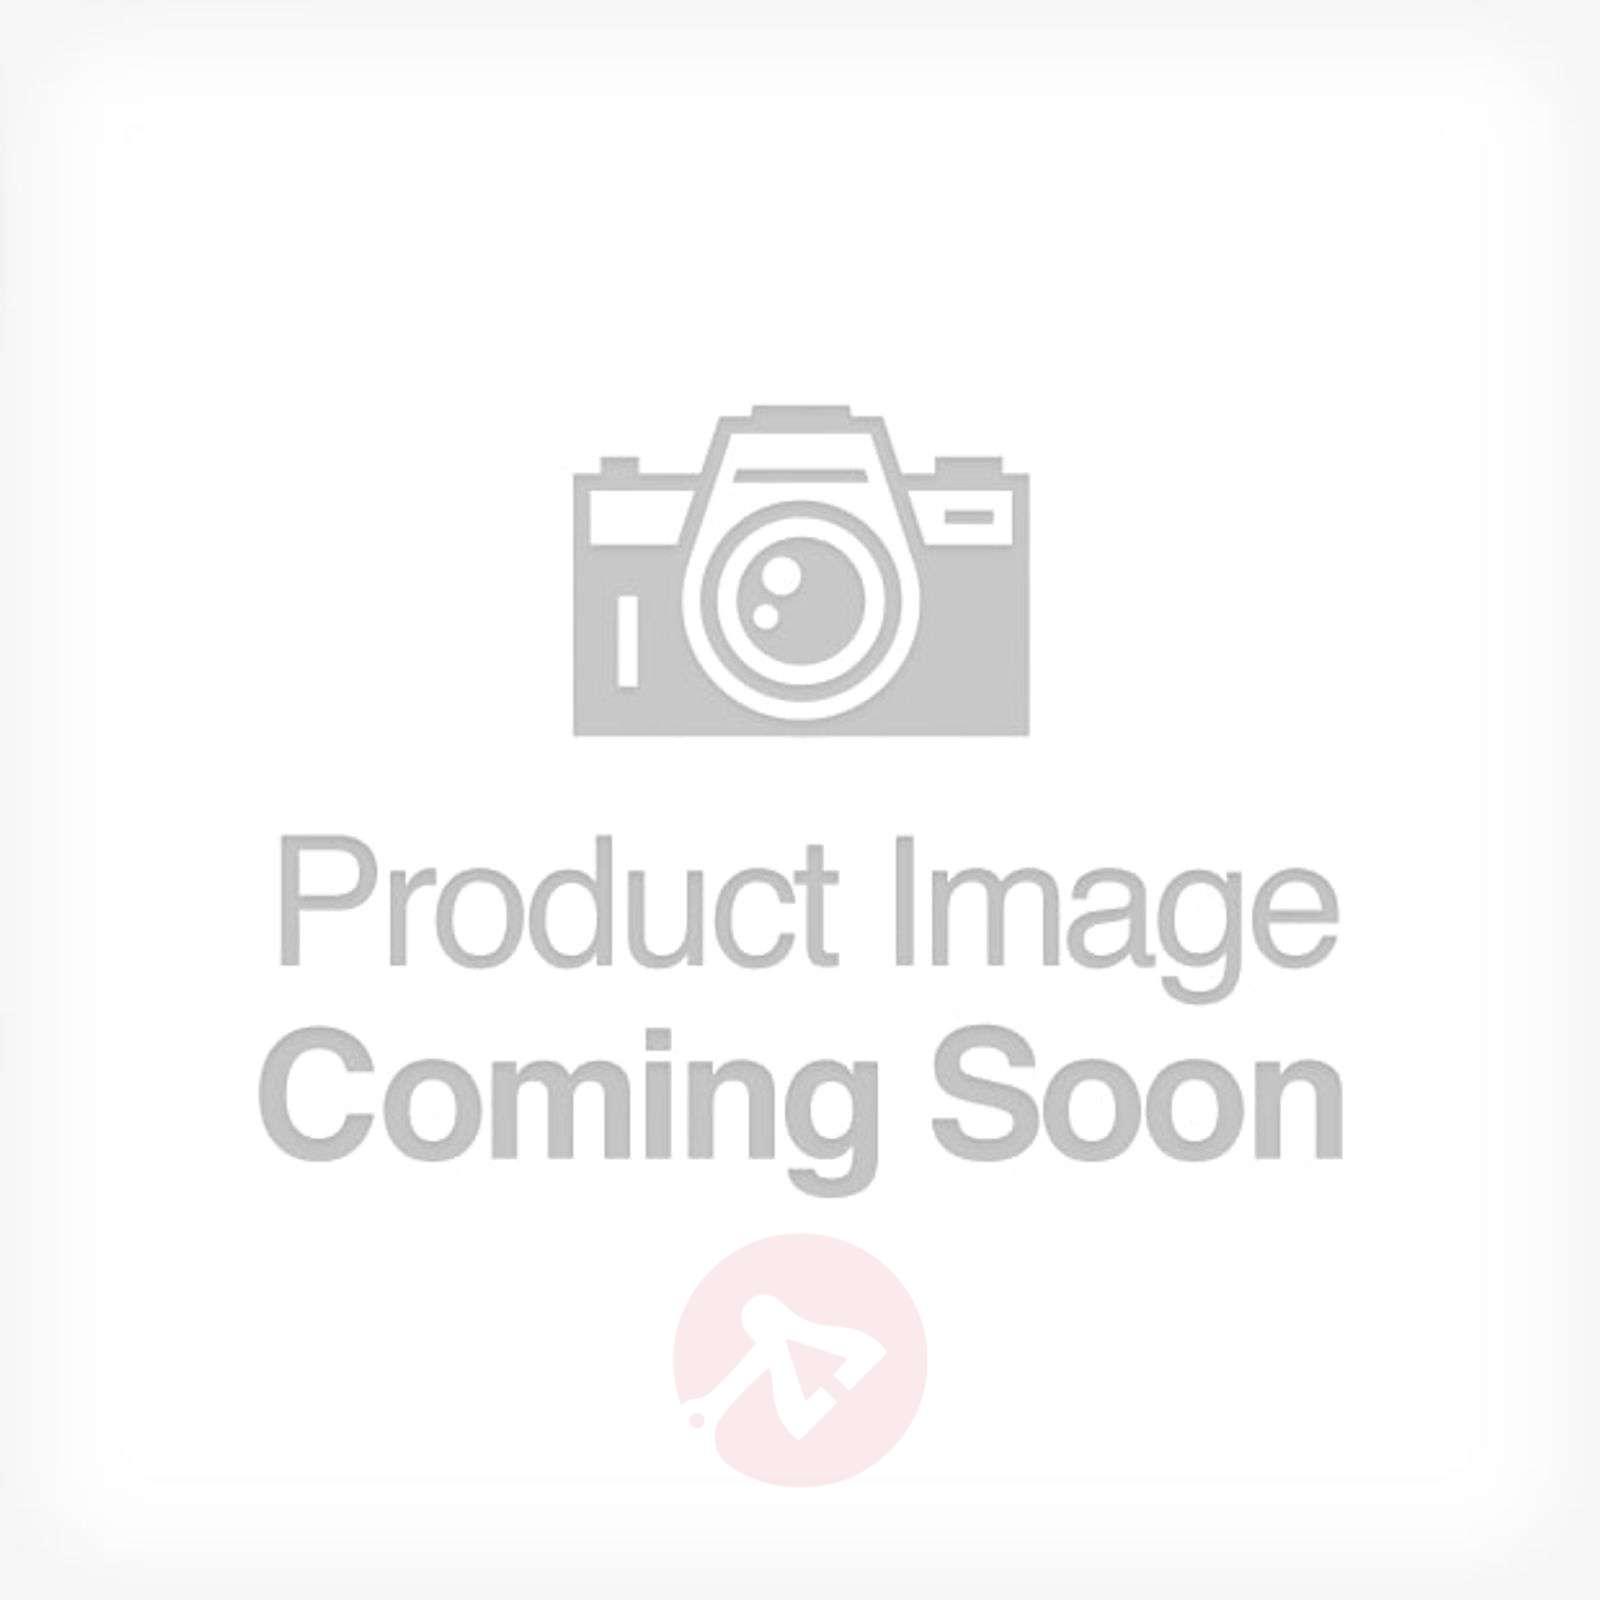 LED sensor outdoor wall light CAM light-8505730-01